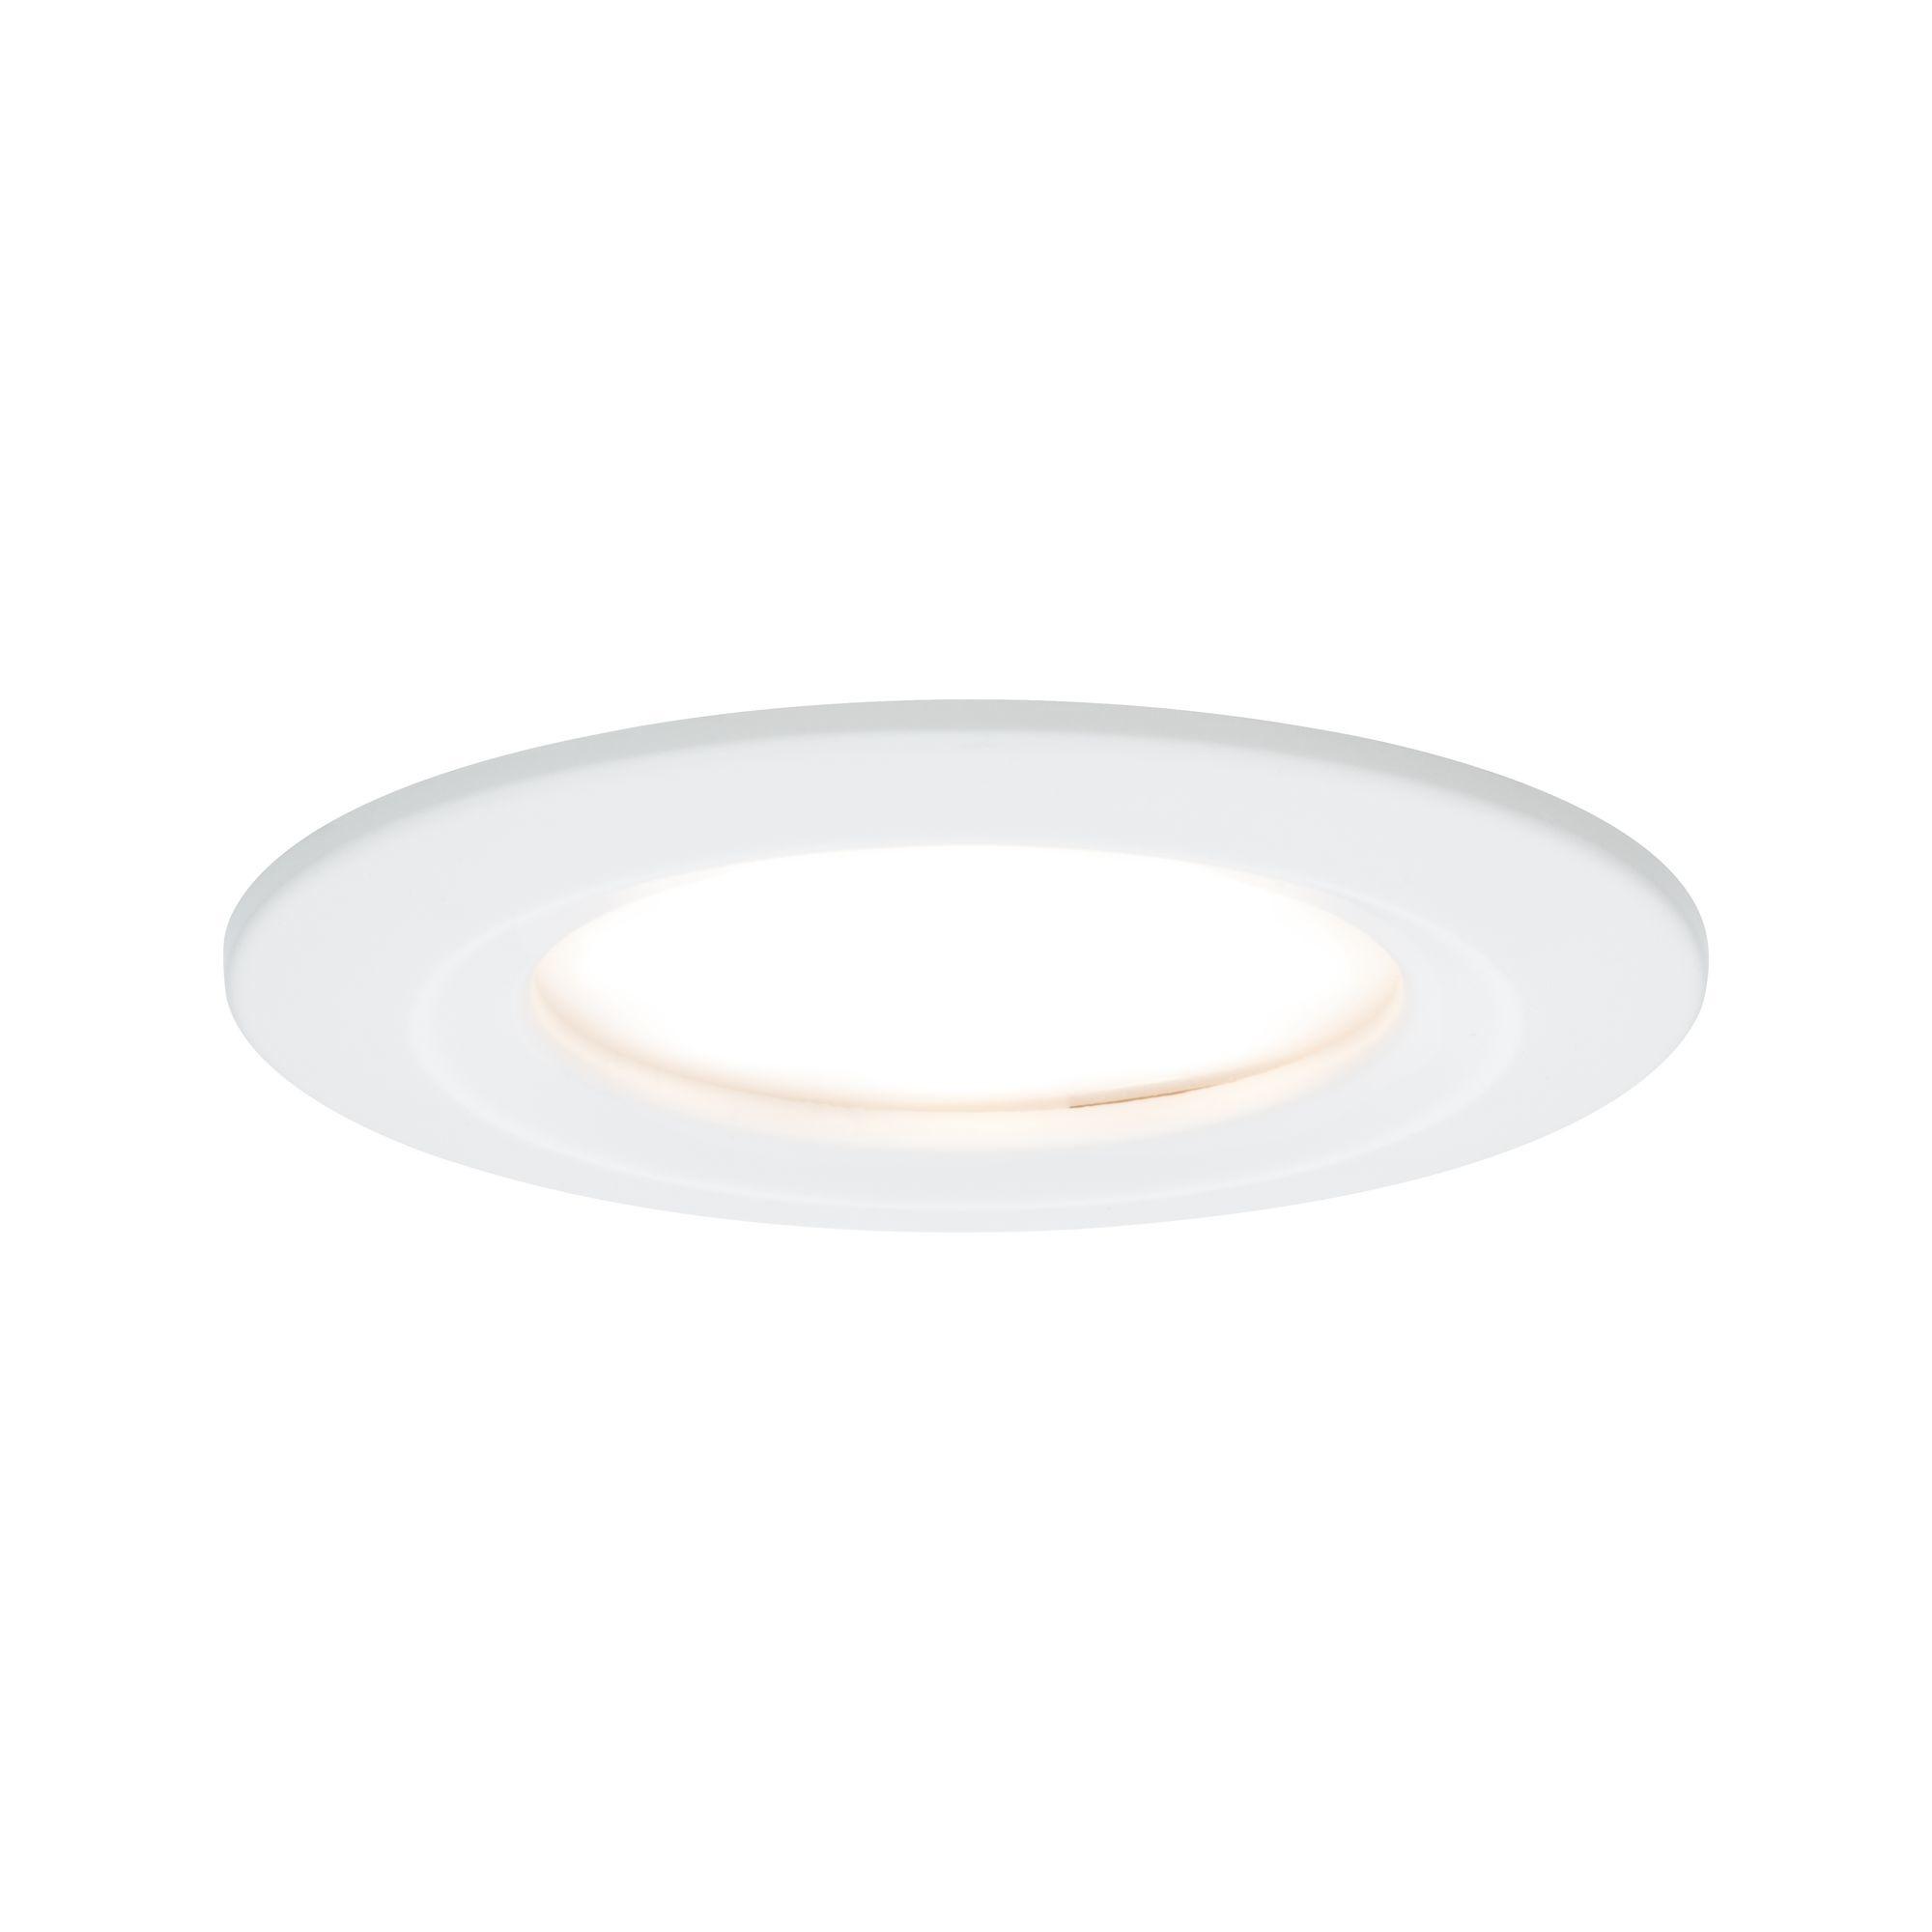 Paulmann EBL Set Nova Coin rund starr LED 1x6,5W2700K 230V Weiß matt/Alu